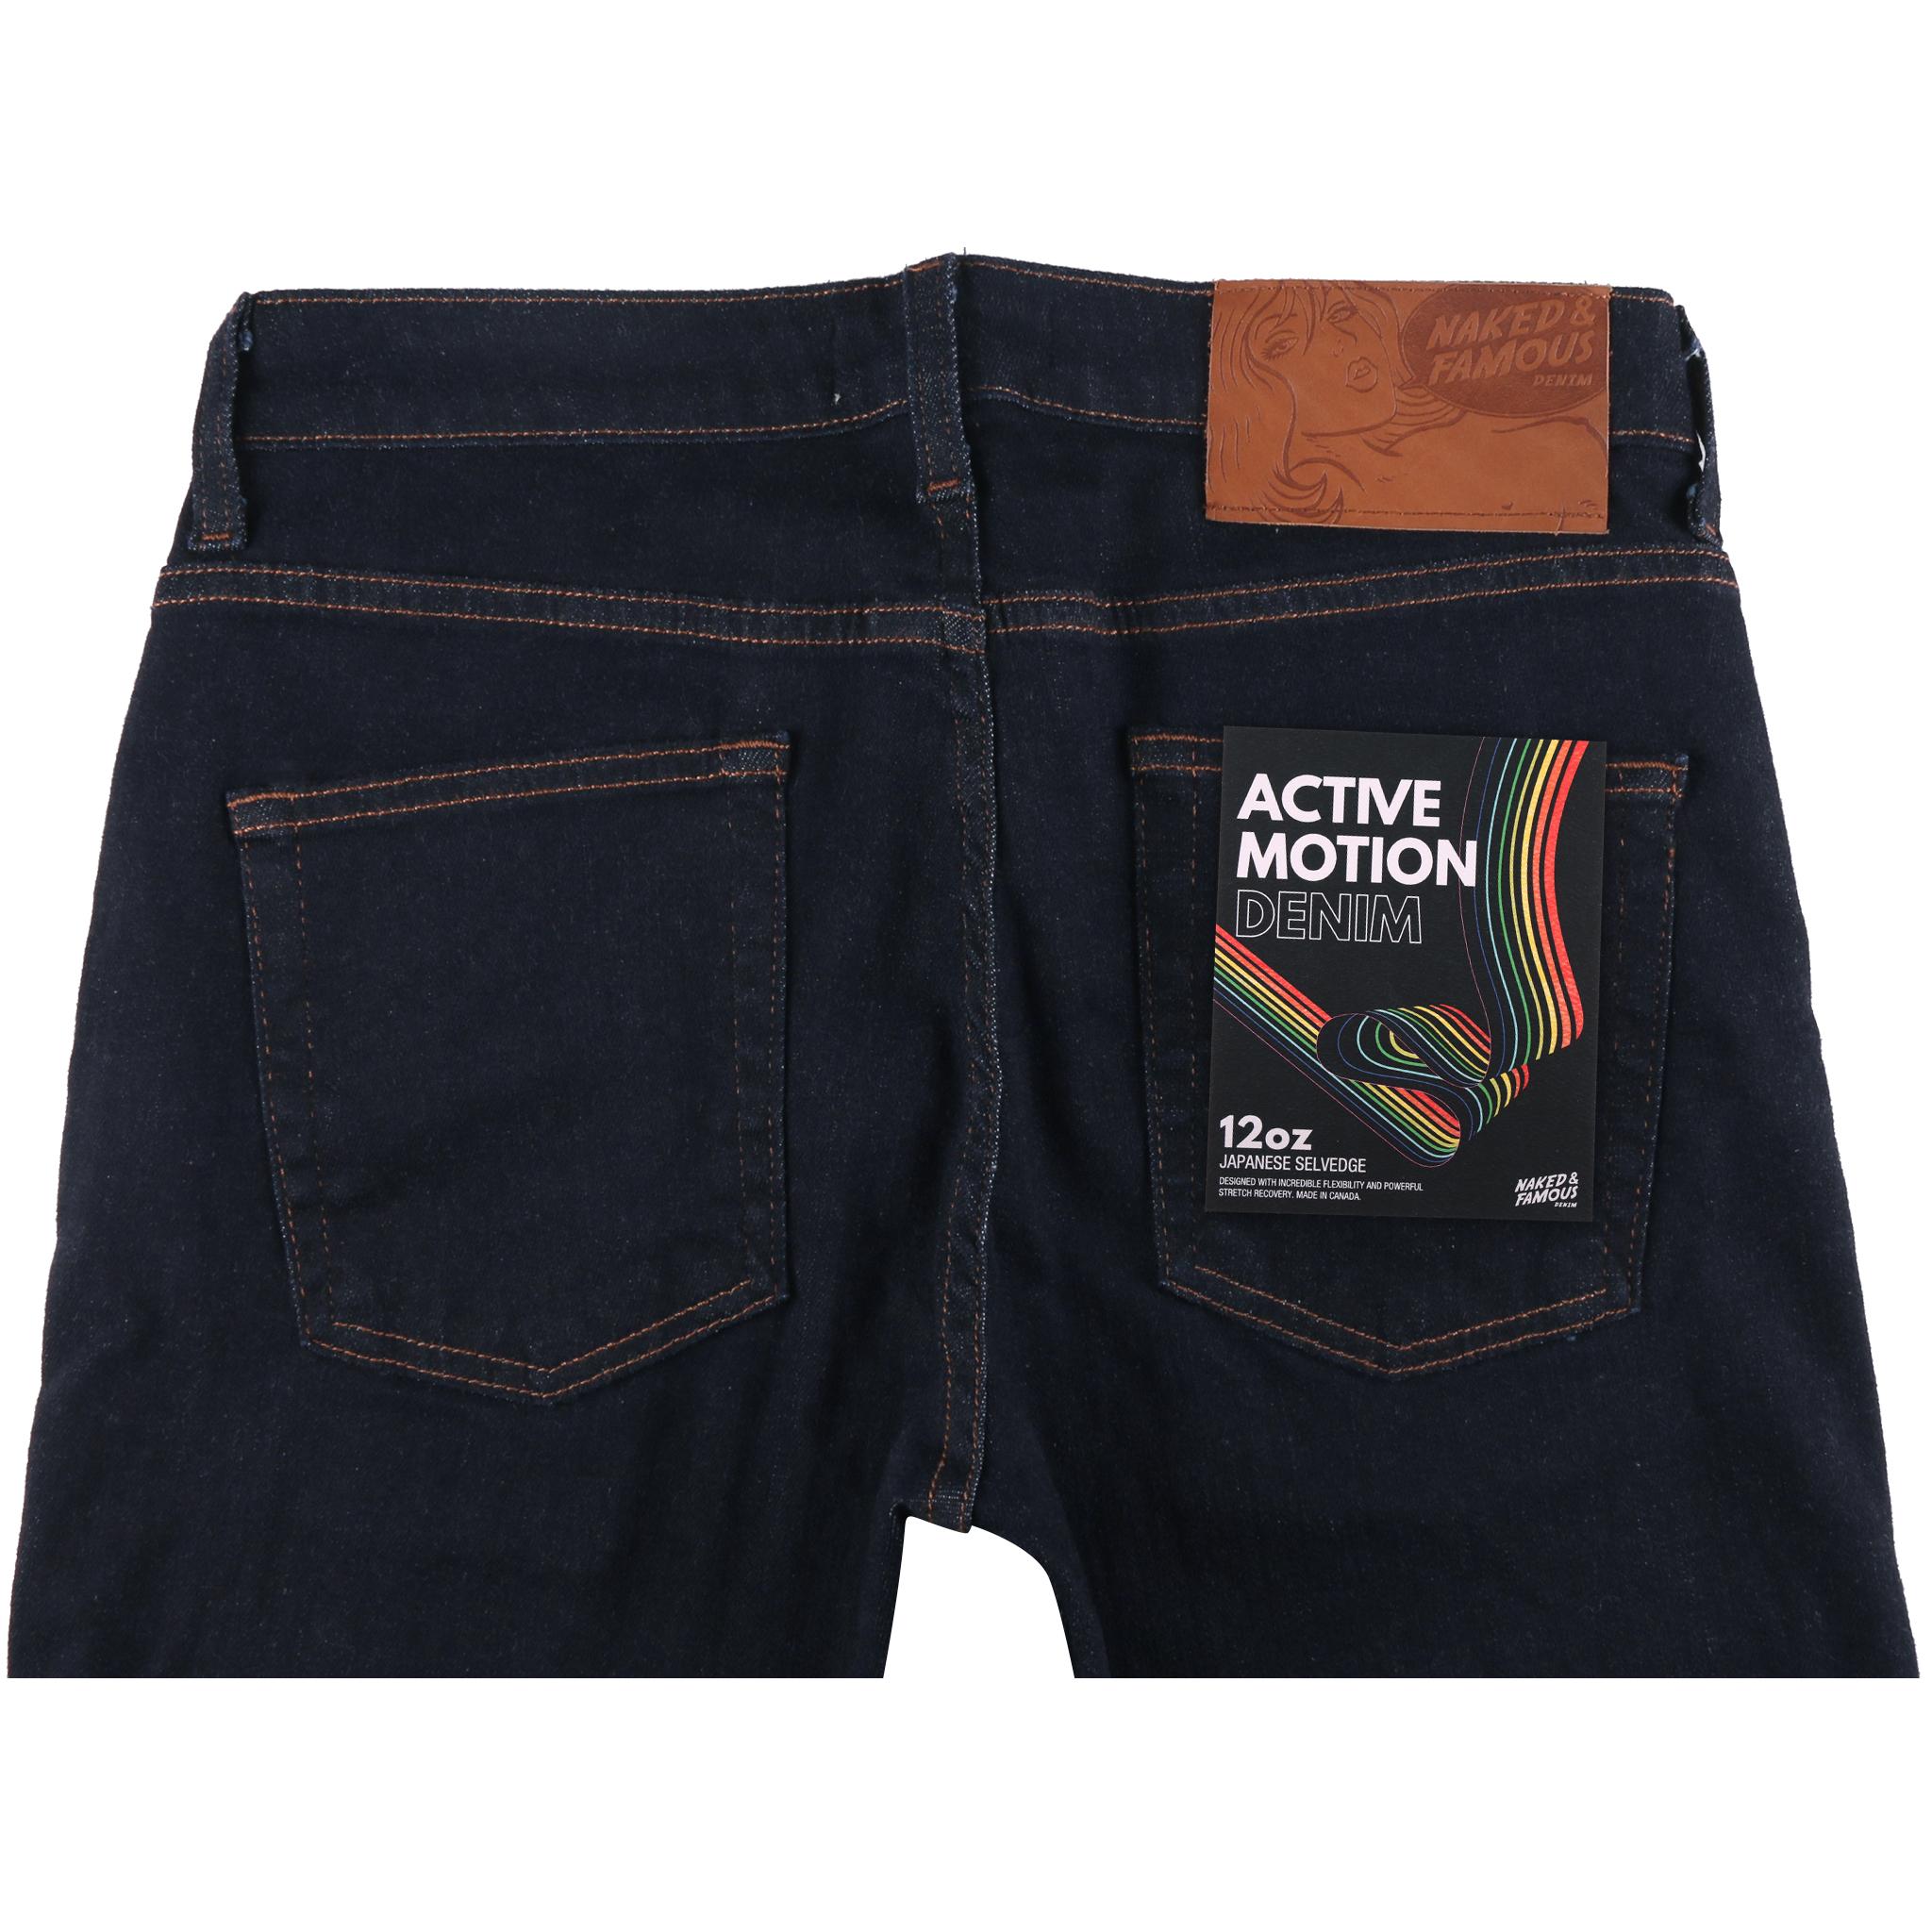 Active Motion Denim Jean Back View